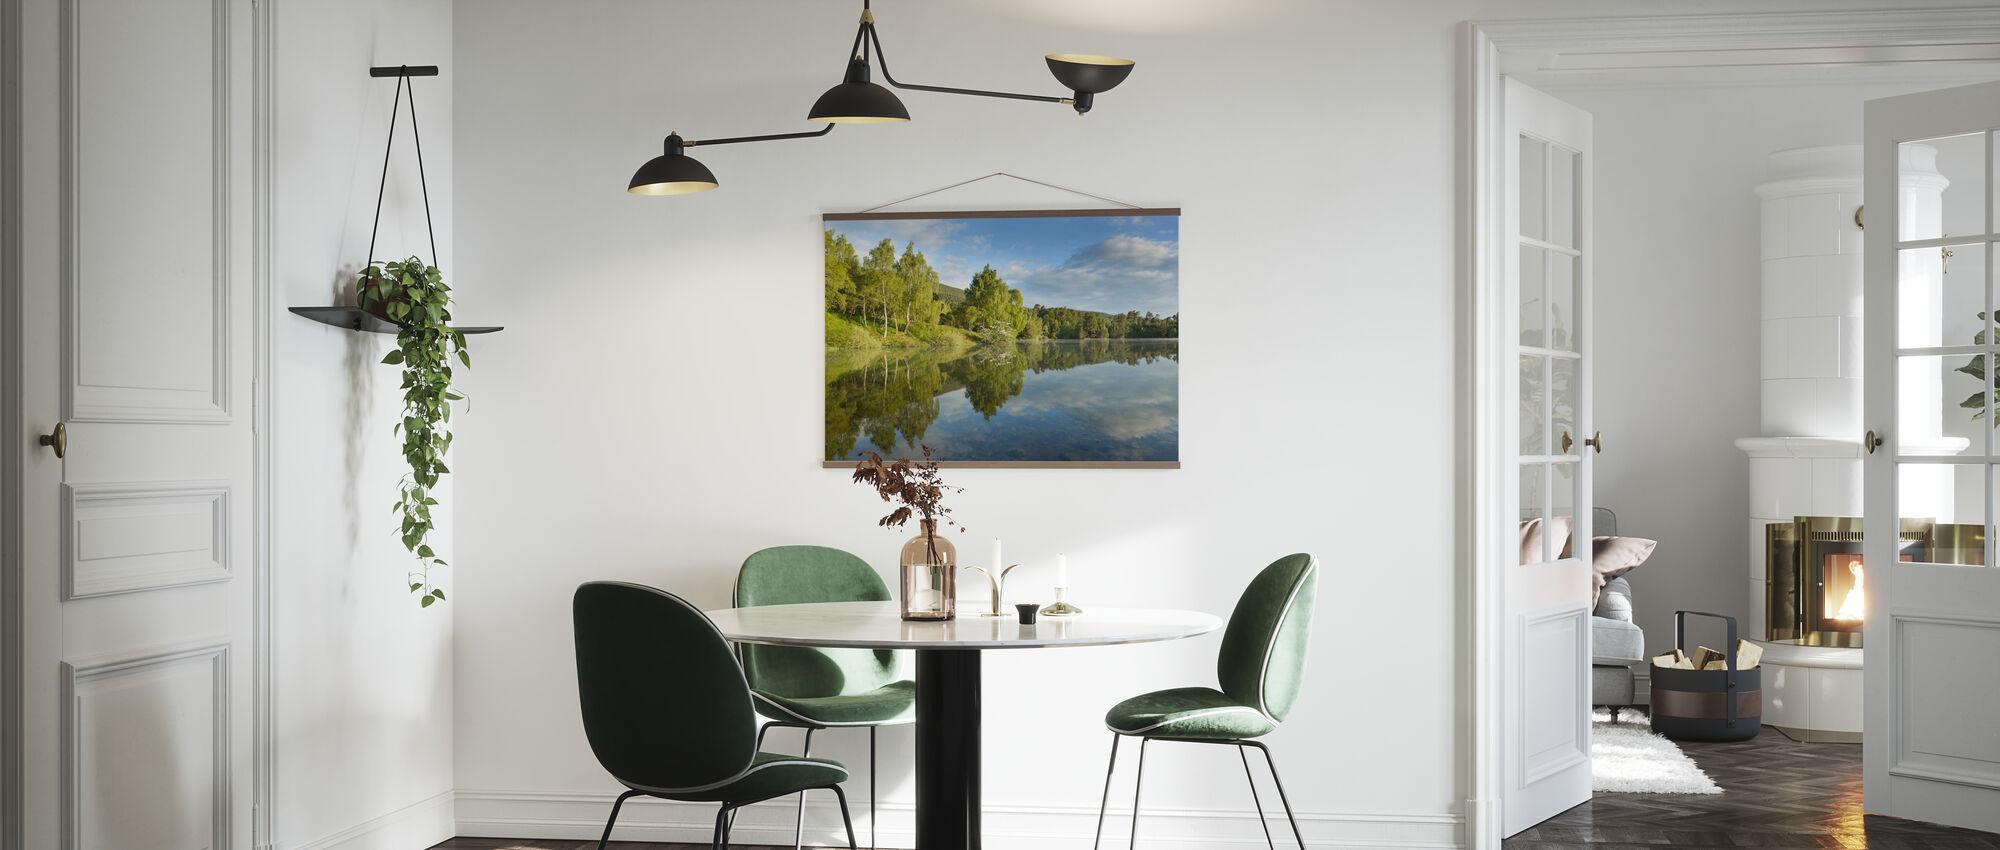 Peaceful Summer Lake - Poster - Kitchen